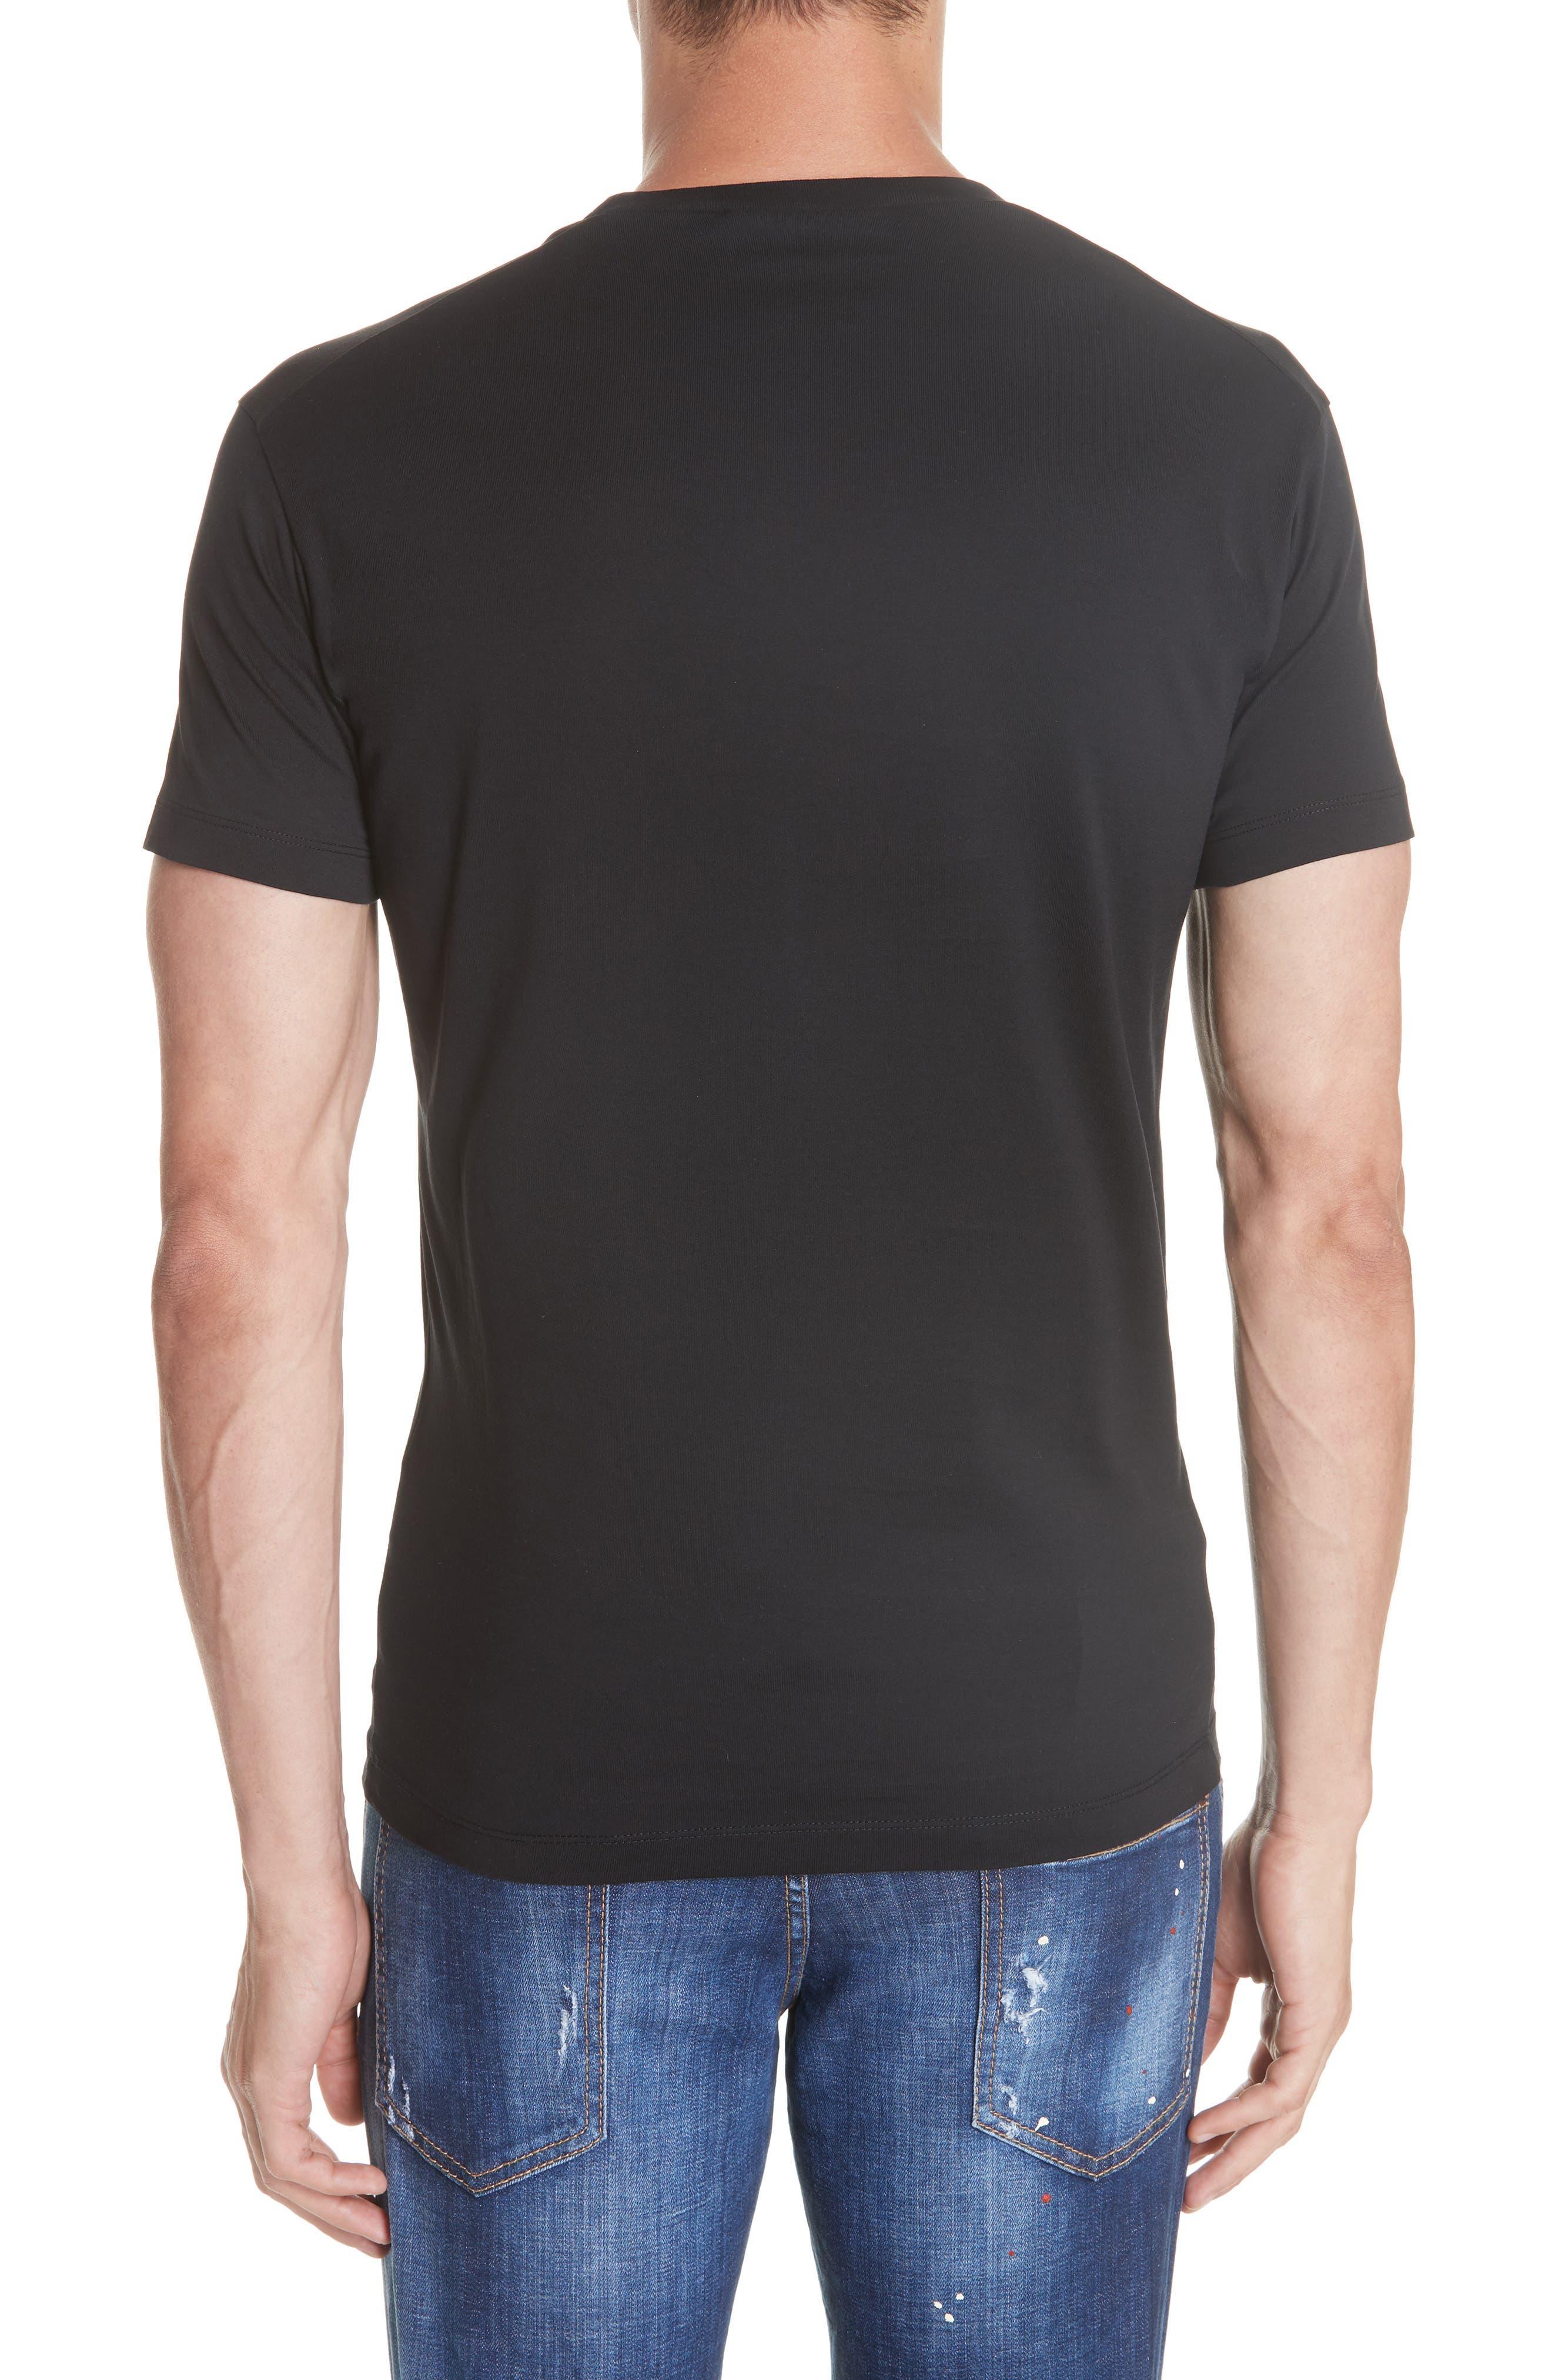 Studio 54 Graphic T-Shirt,                             Alternate thumbnail 2, color,                             001